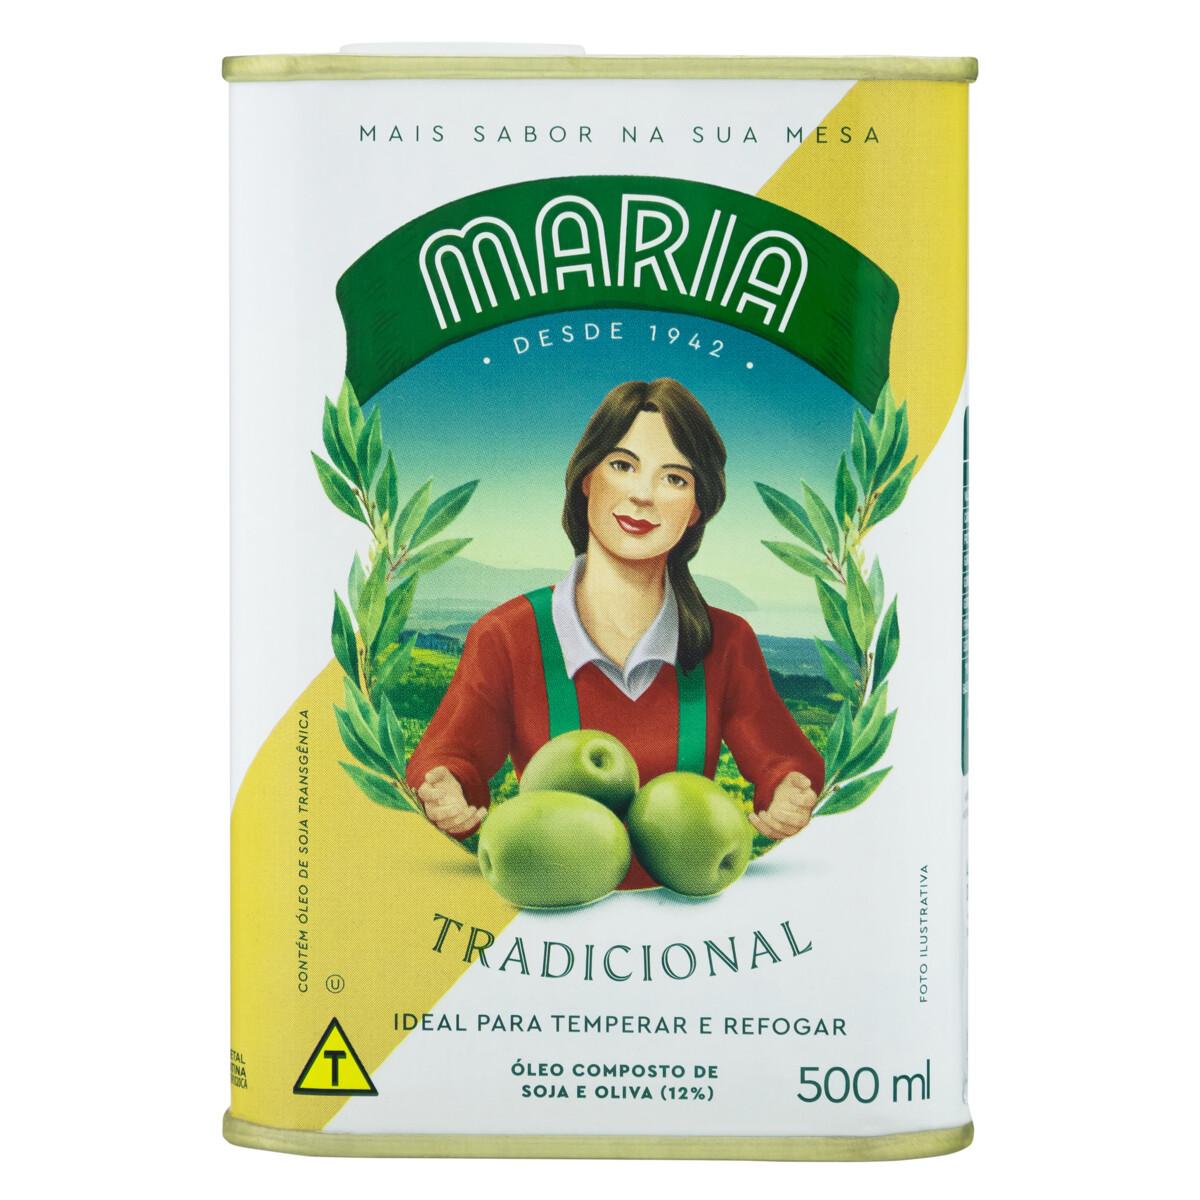 Óleo Composto De Soja E Oliva Tradicional Maria Lata 500ml